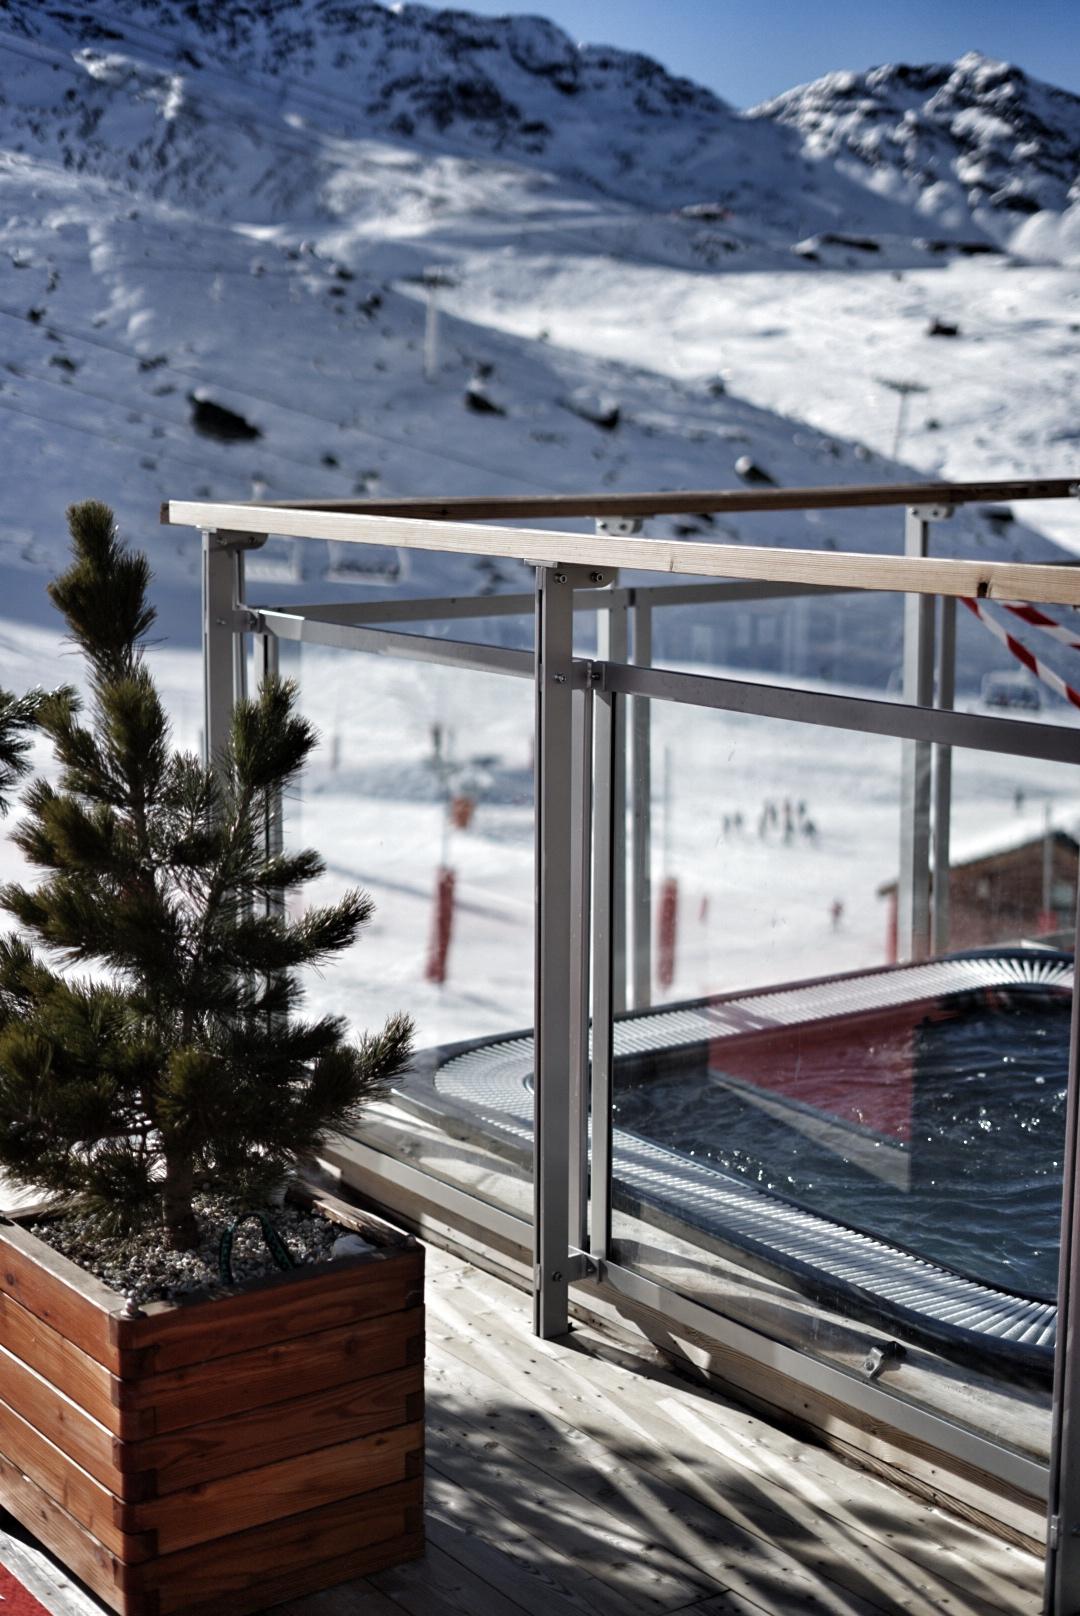 relaxation, spa, area, val thorens, pashmina, hotel, pashmina hotel, refuge, terrace, mountain, trip, holidays